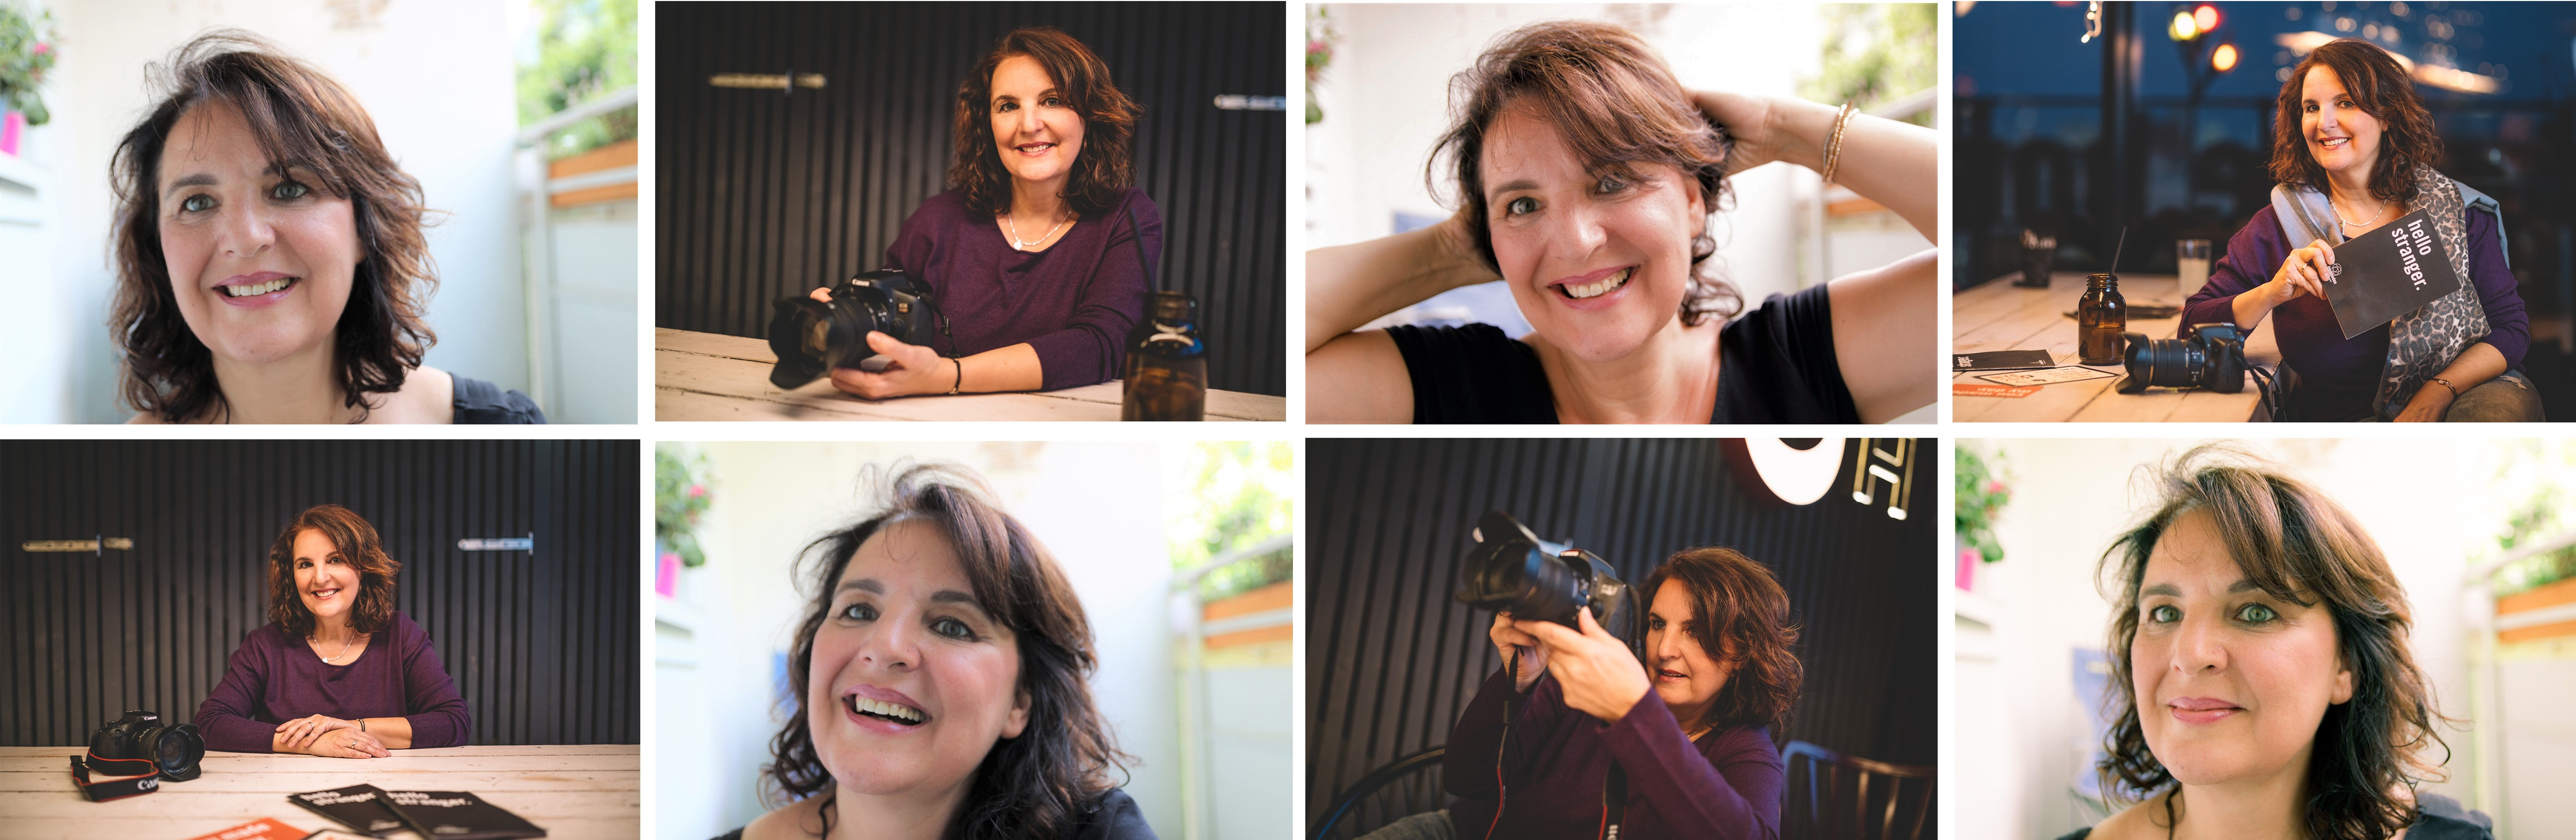 Profilfotos von Silvia Jandl zum Thema Good Vibes